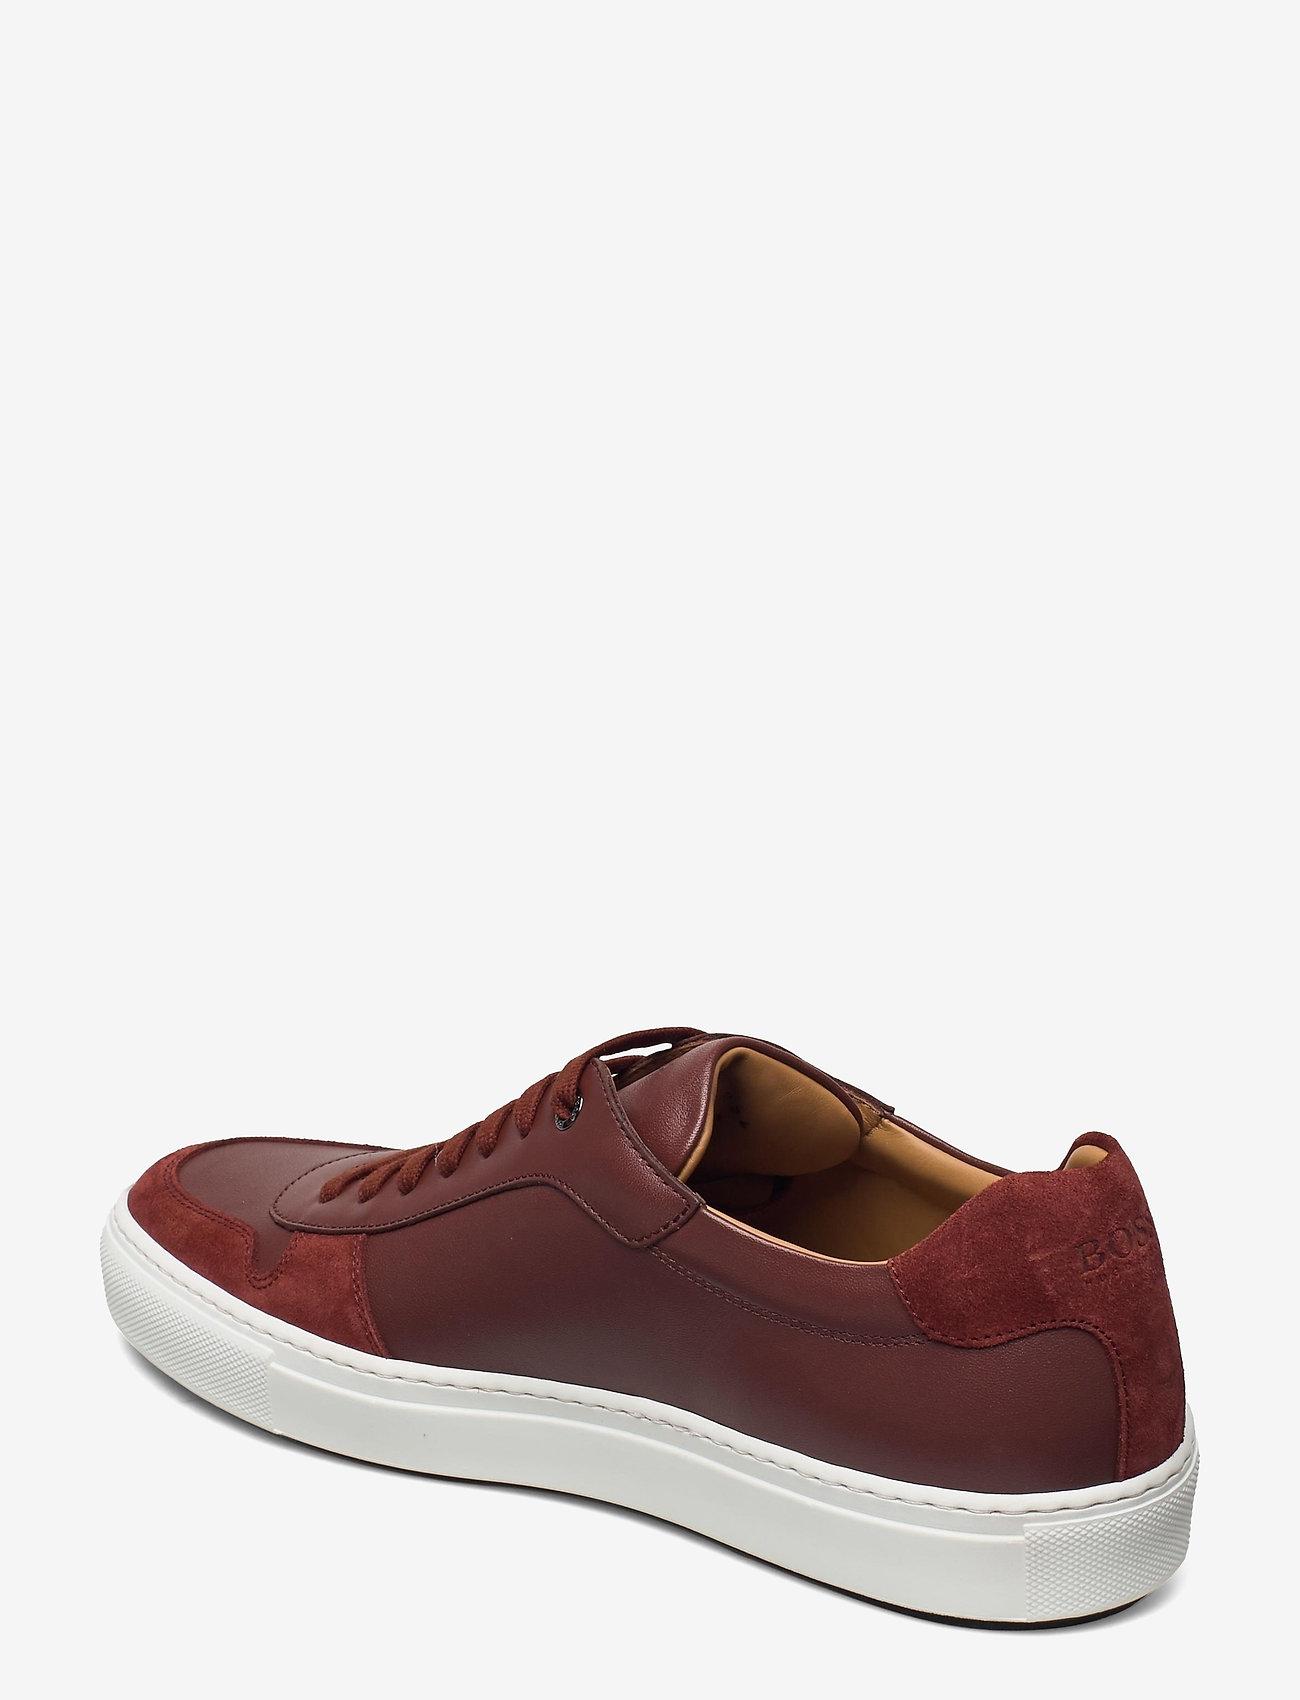 BOSS - Mirage_Tenn_oxns - låga sneakers - rust/copper - 2